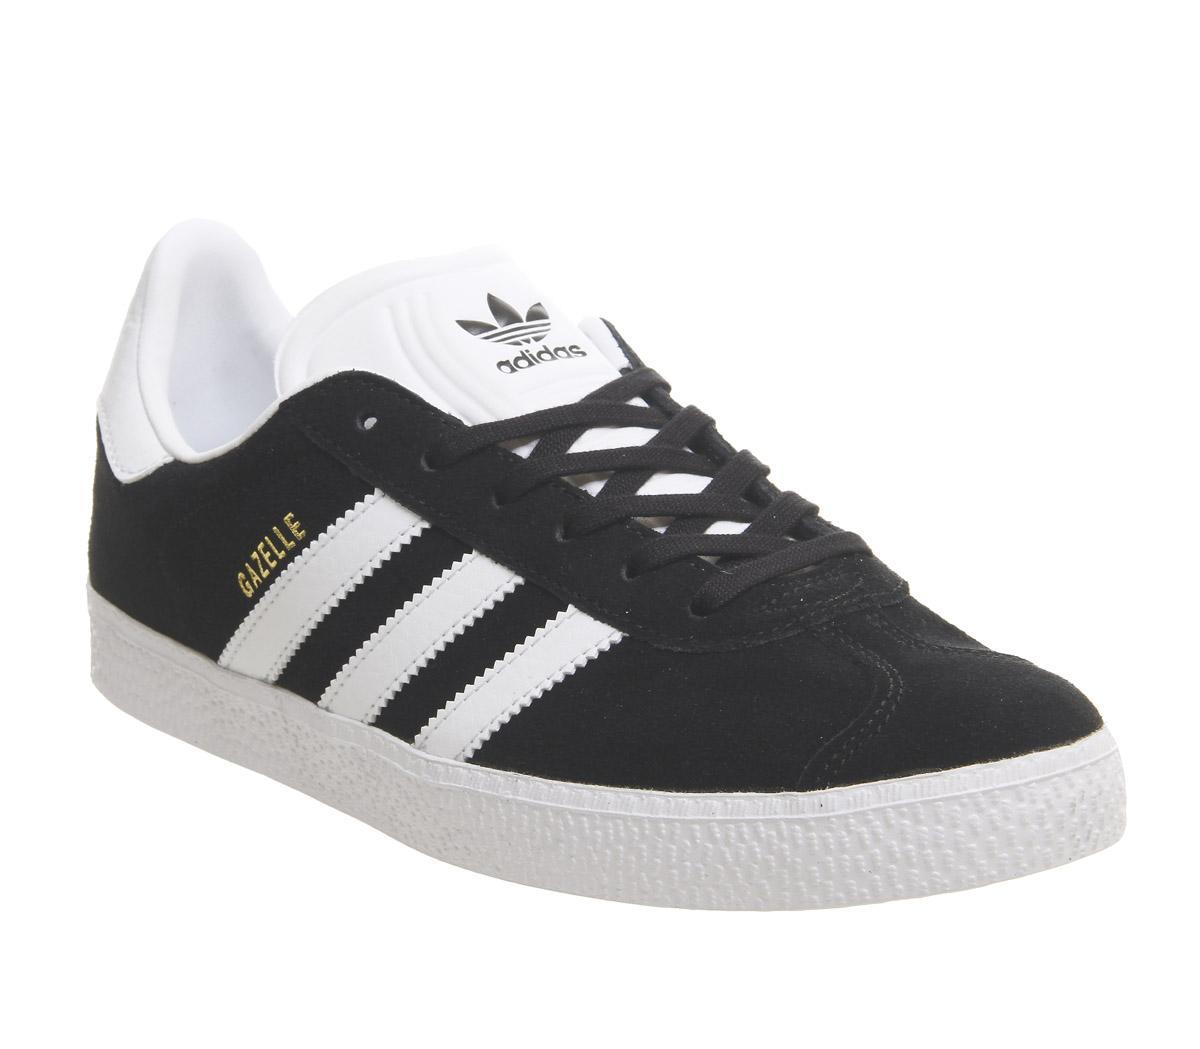 adidas Gazelle Jnr Trainers Core Black